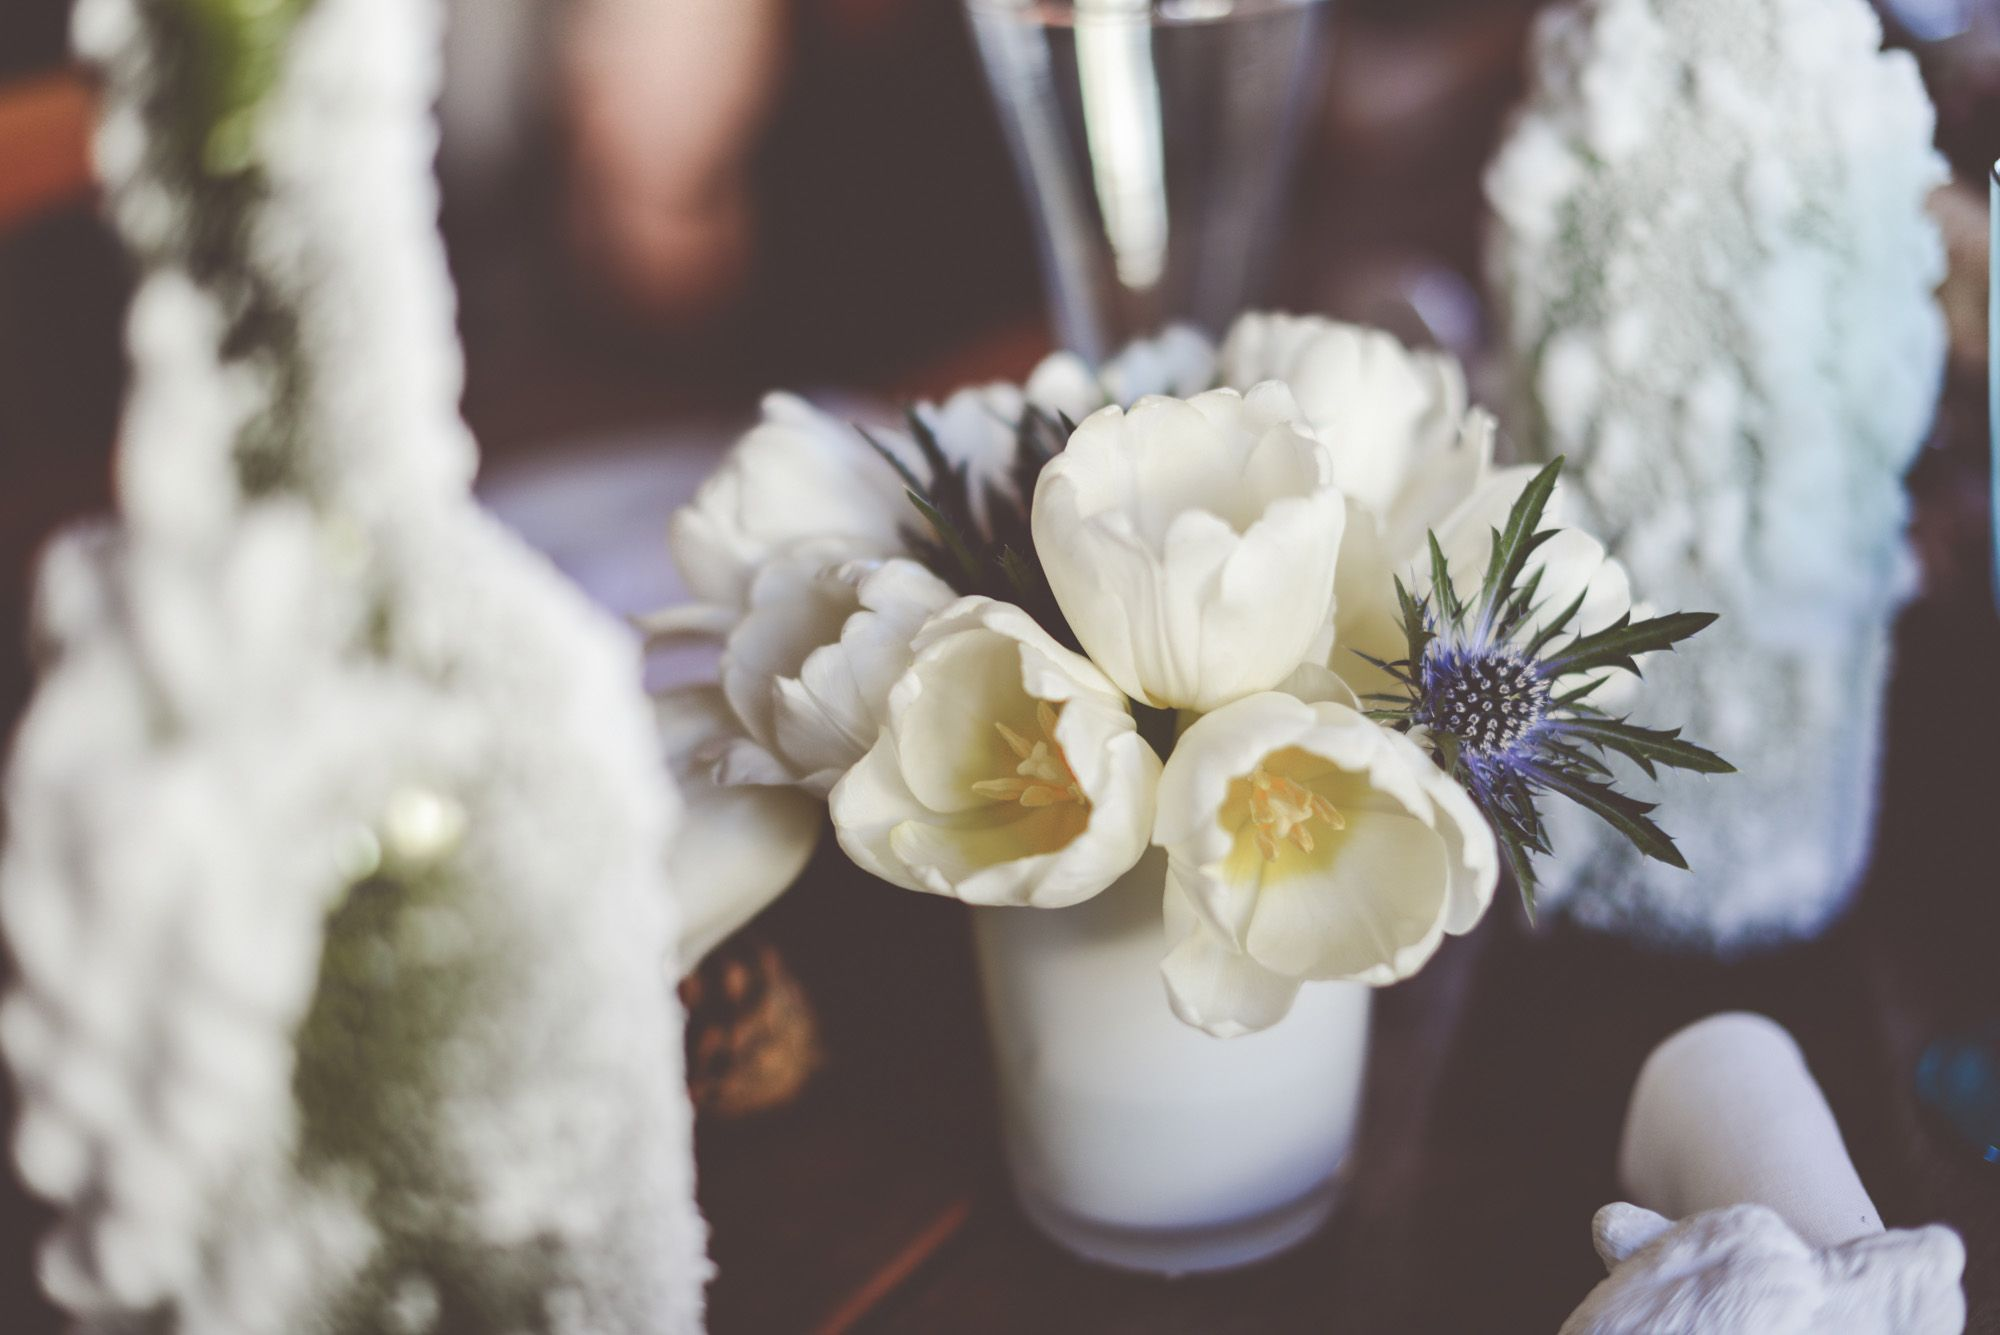 cejourla-photographie-mariage-hiver-winter-wedding-15.jpg 2000×1335 pixels